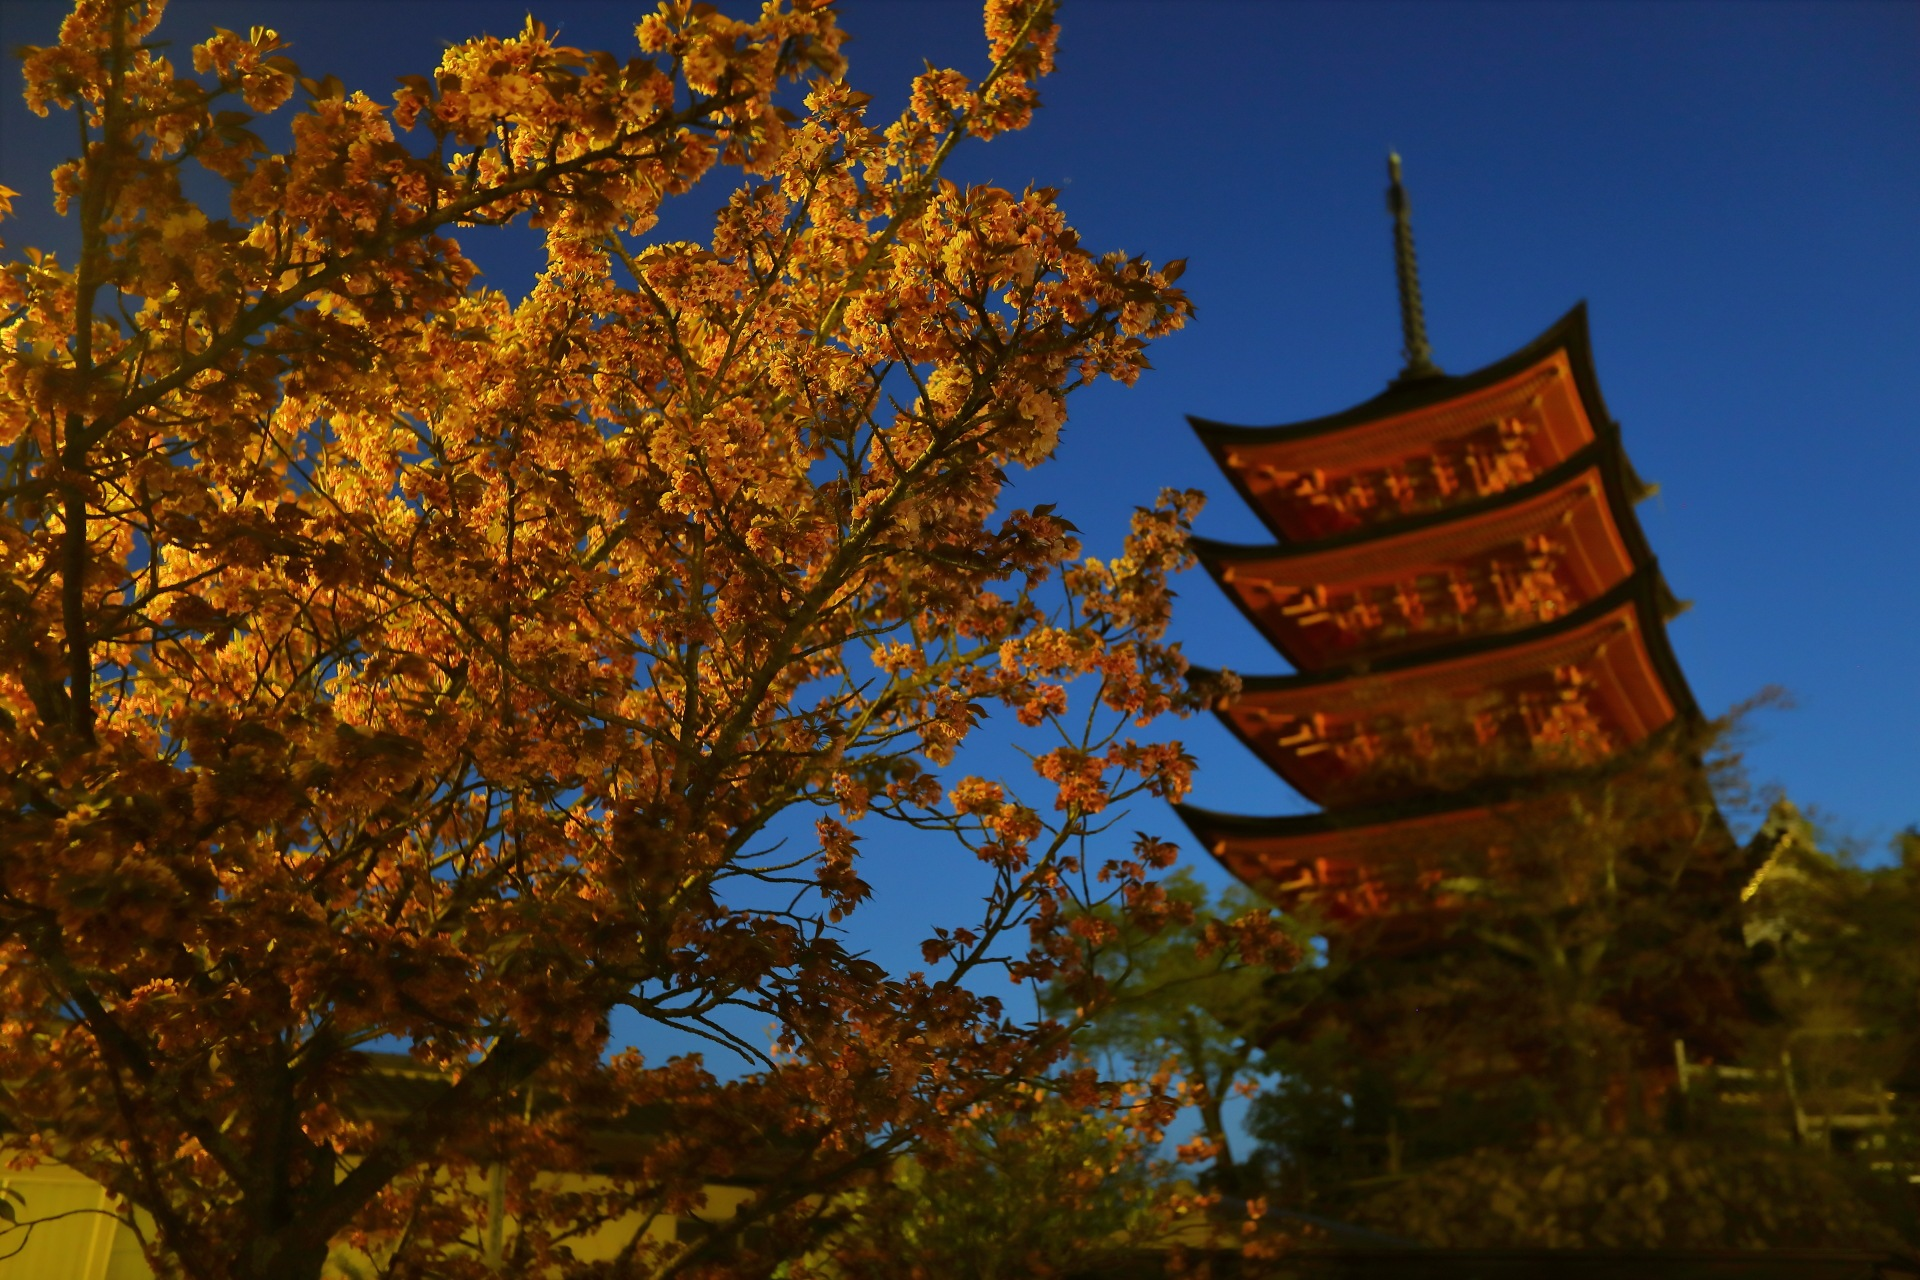 Night View of Sakura and Pagoda by takashi.mizoguchi